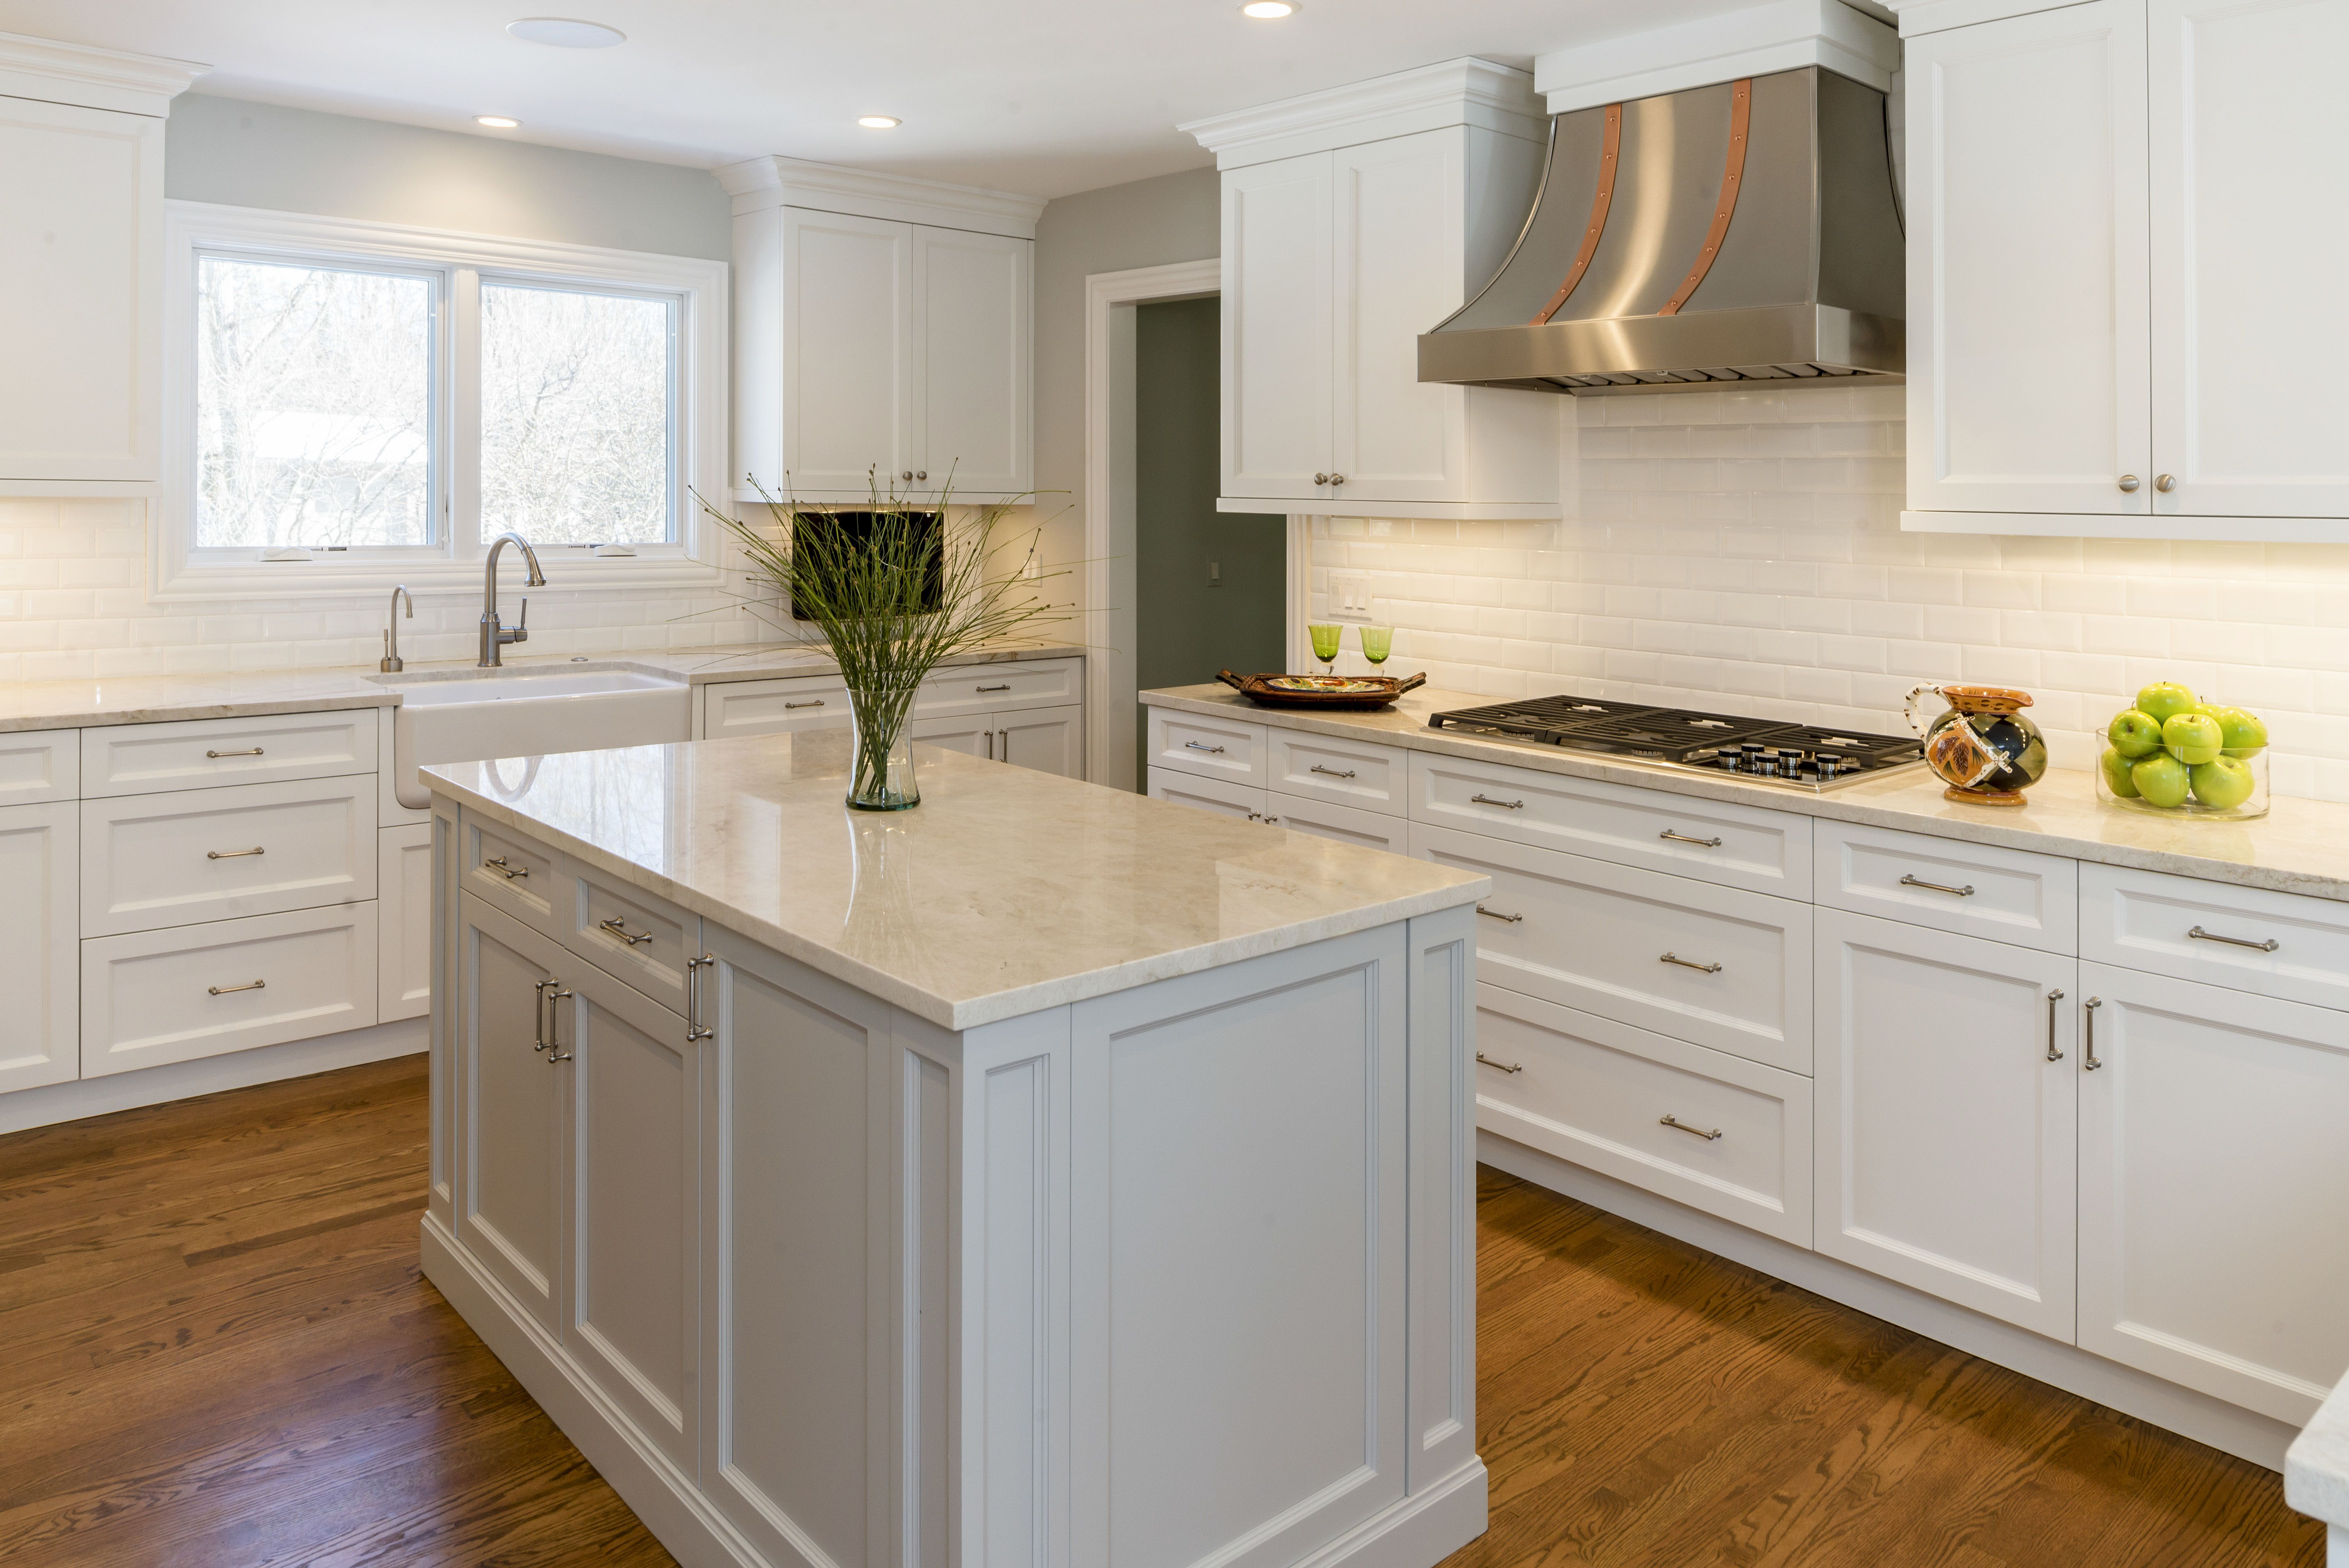 White kitchen. Granite Countertops. Stainless Steel Stove Hood. Subway tile back splash. Hardwood Floors. Kitchen design. Kitchen ideas. Kitchen remodel.